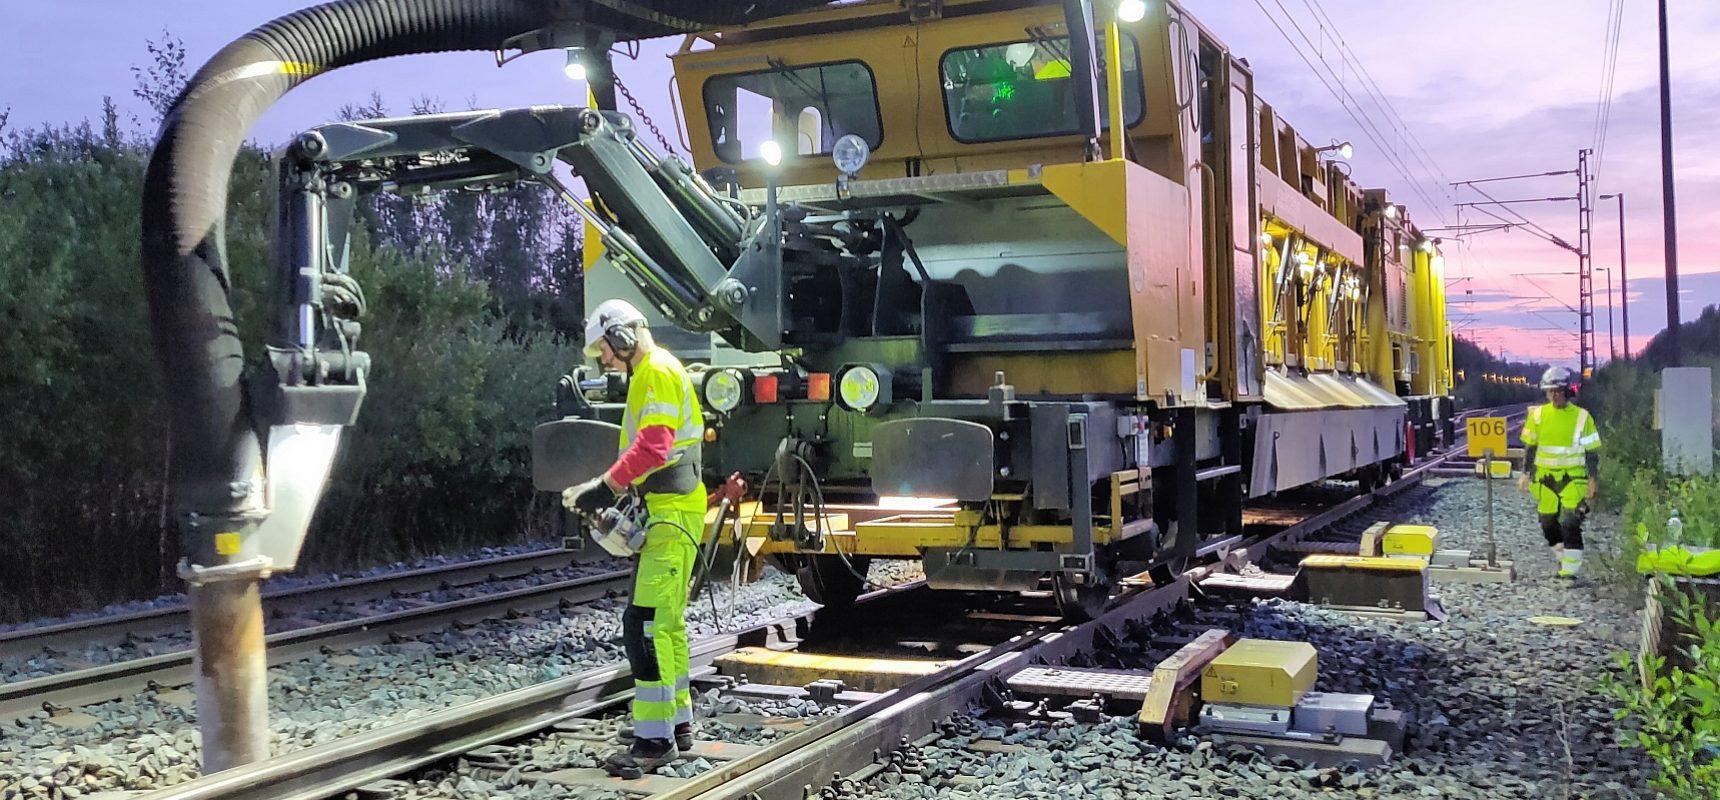 RATEK - Rail Infrastructure - Tel  +358 10 439 5400